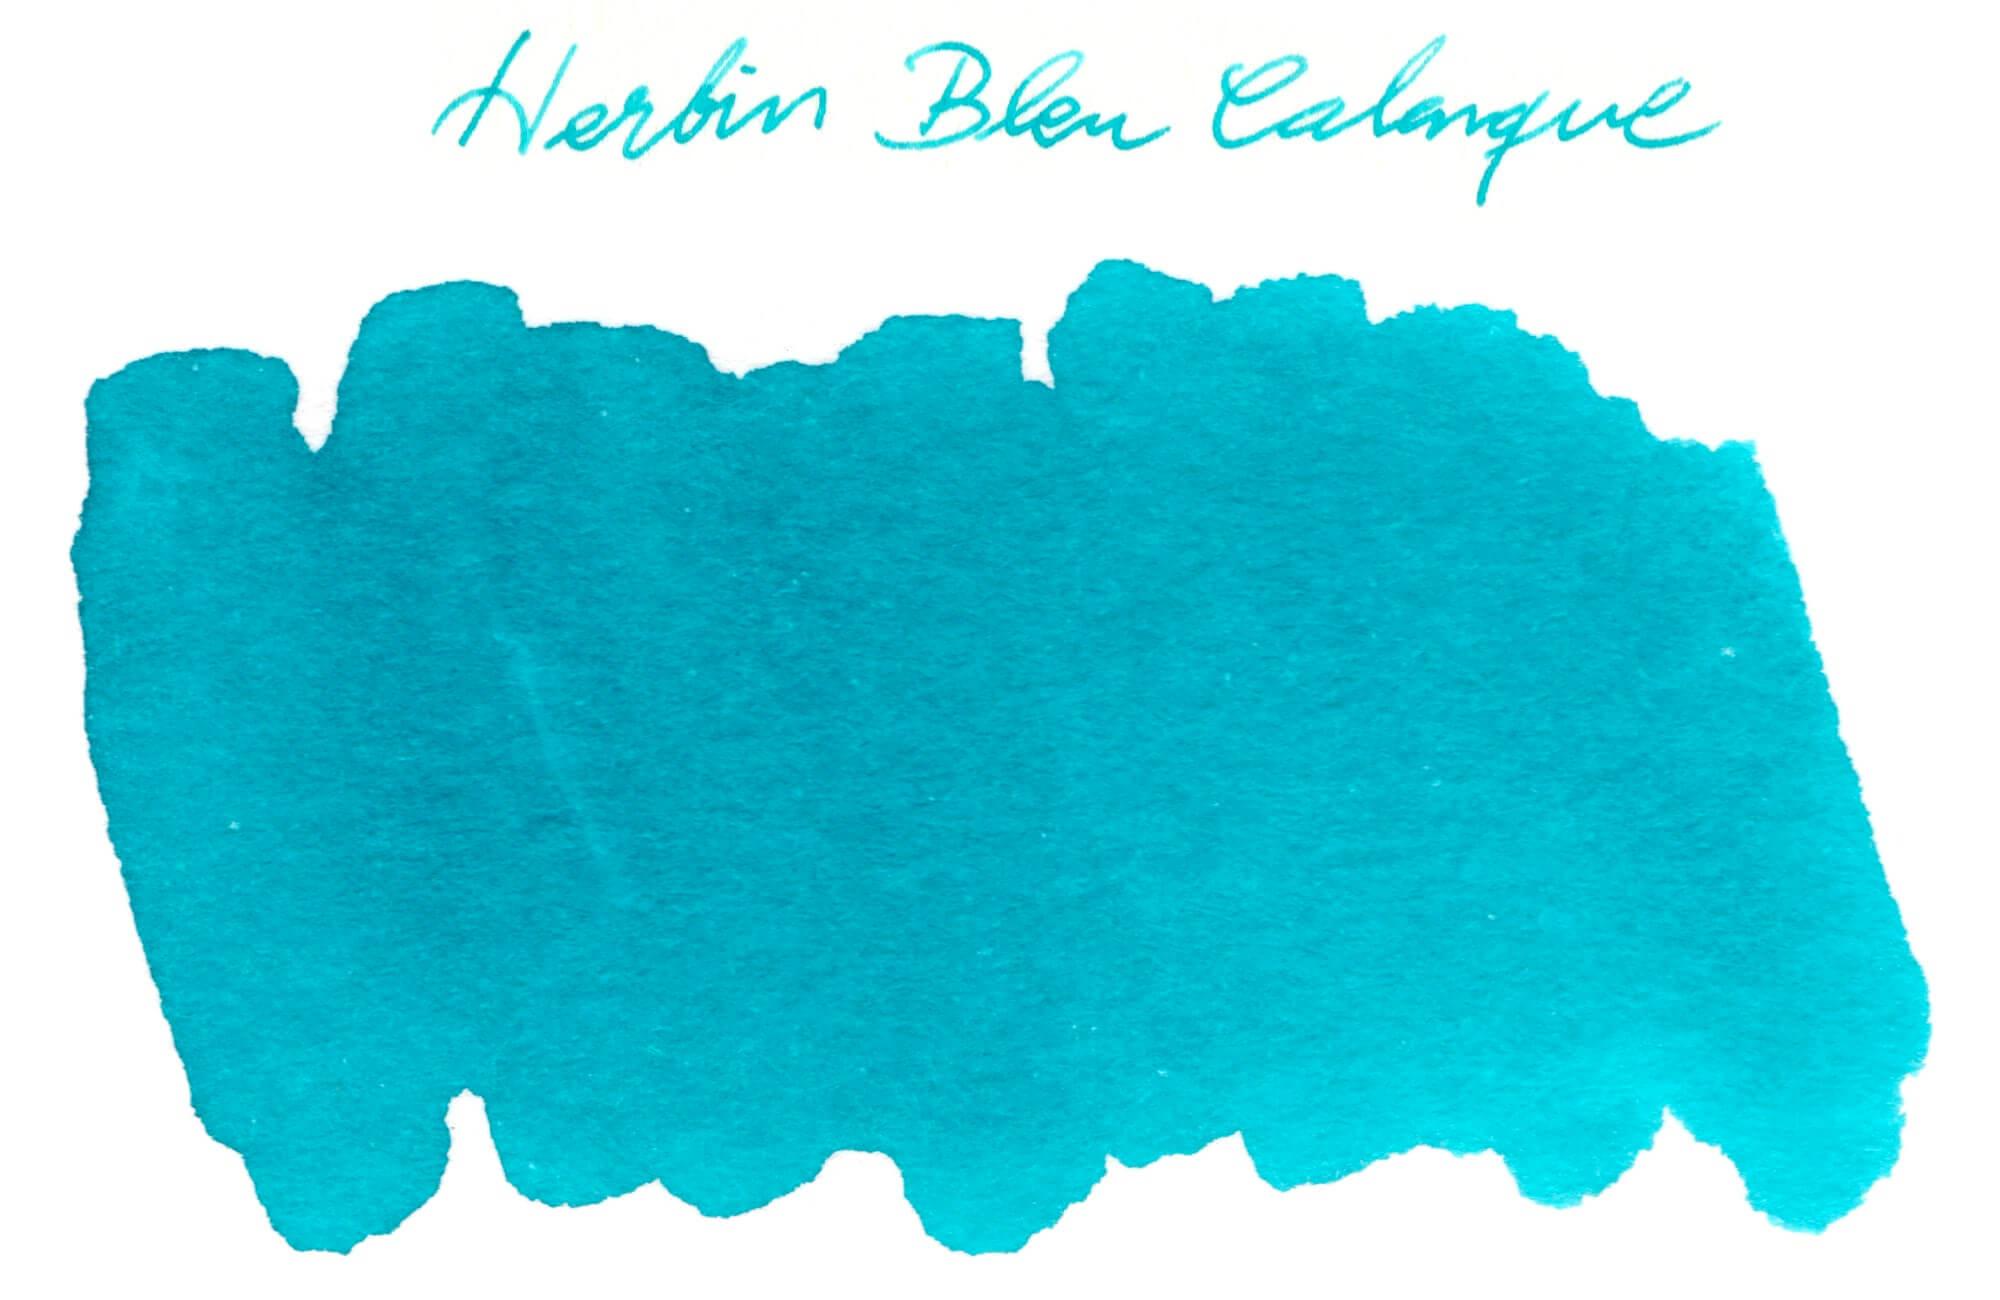 Herbin Bleu Calanque